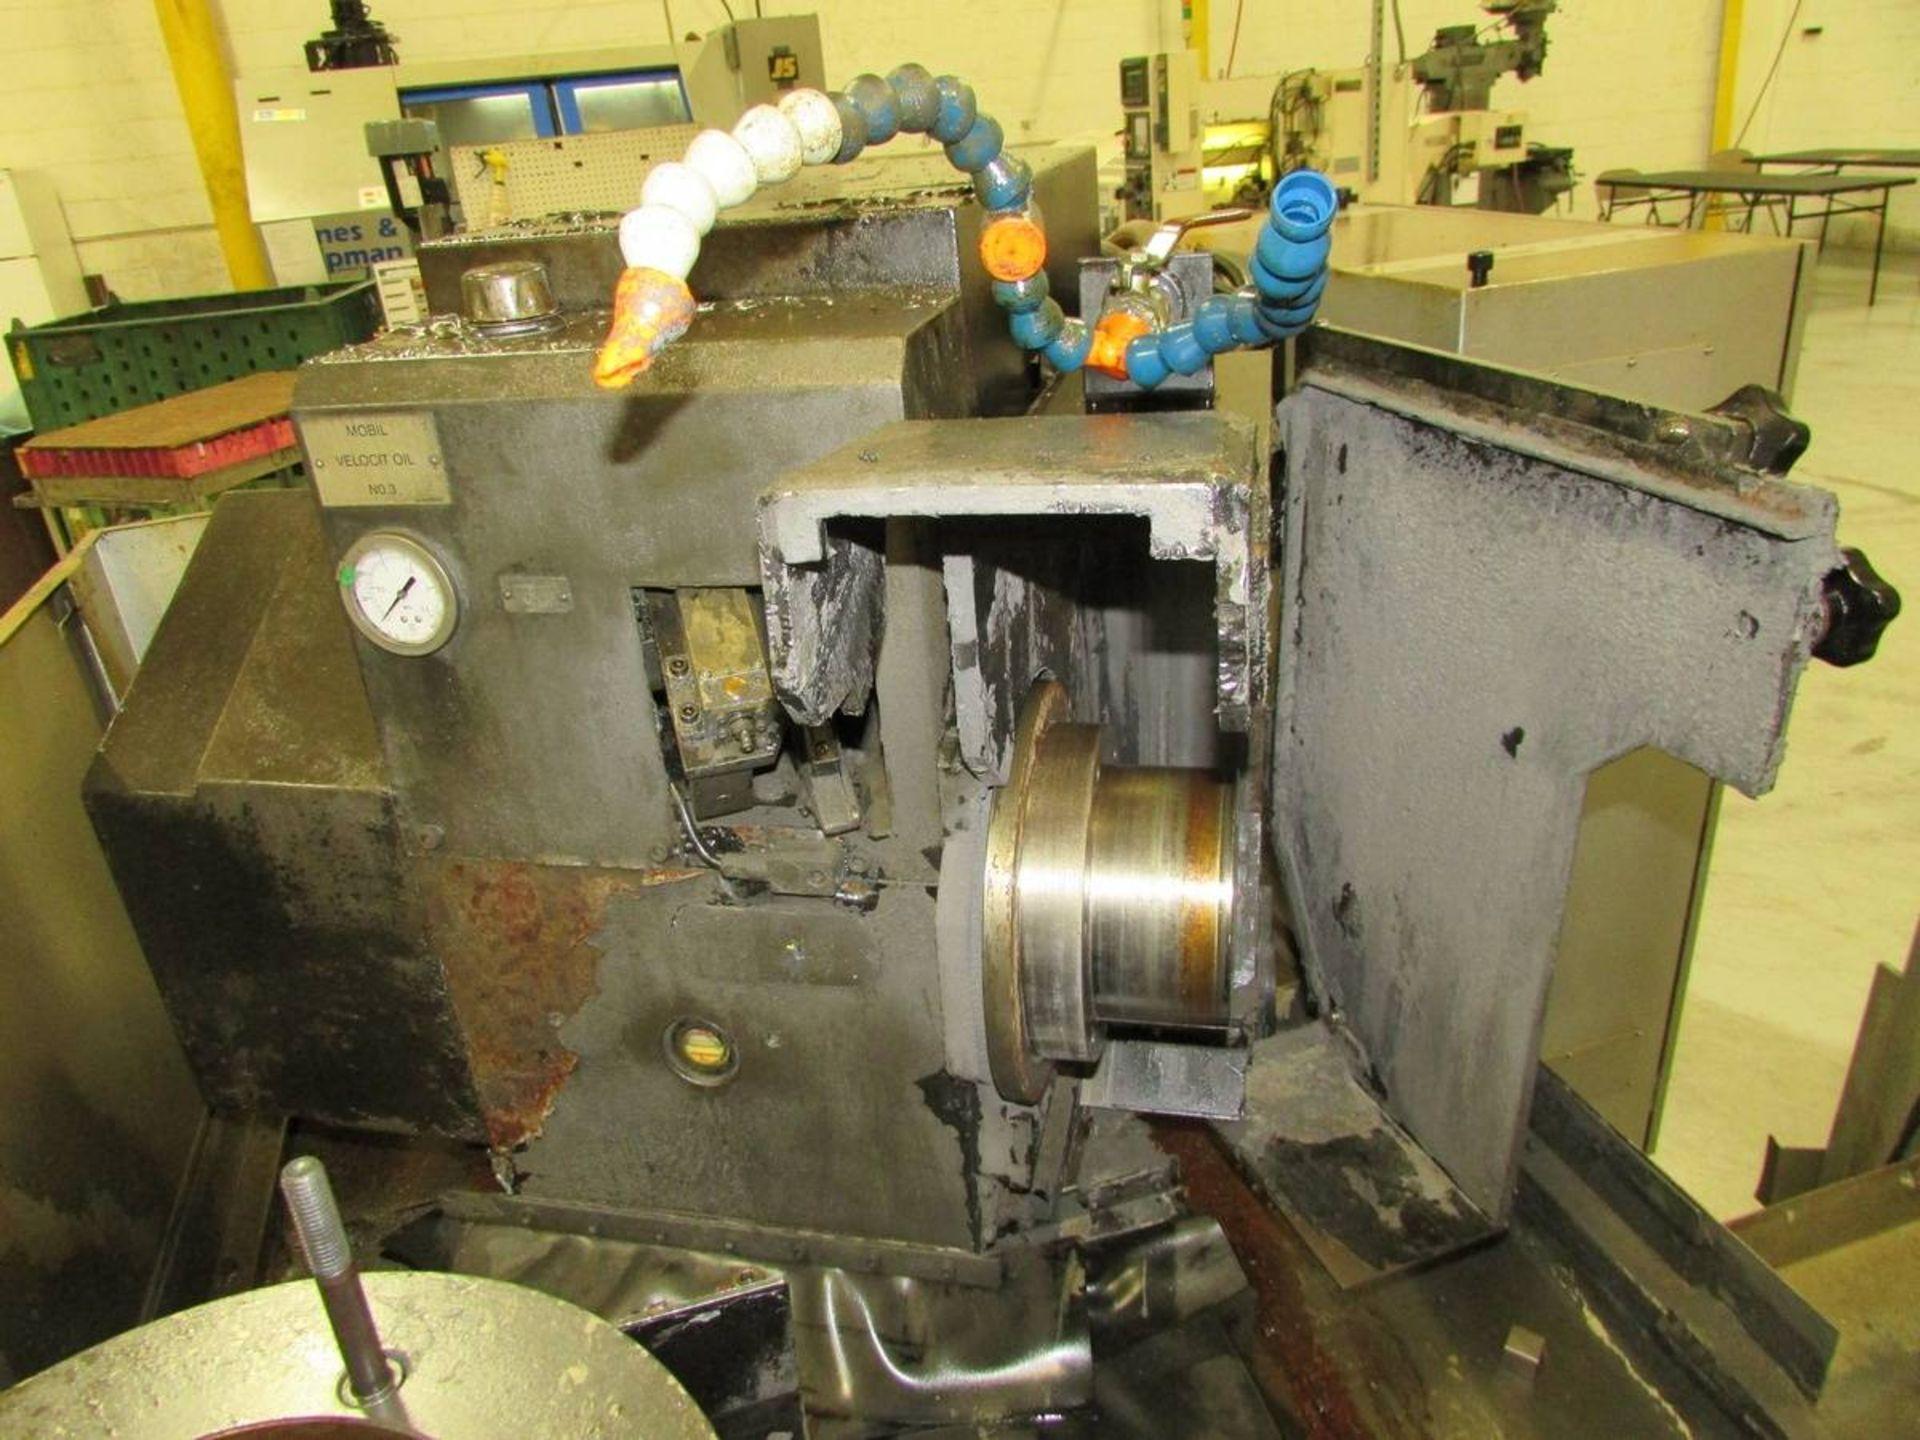 2012 Toyoda/ JTEKT 45m Select G II CNC OD Cylindrical Grinder - Image 5 of 21